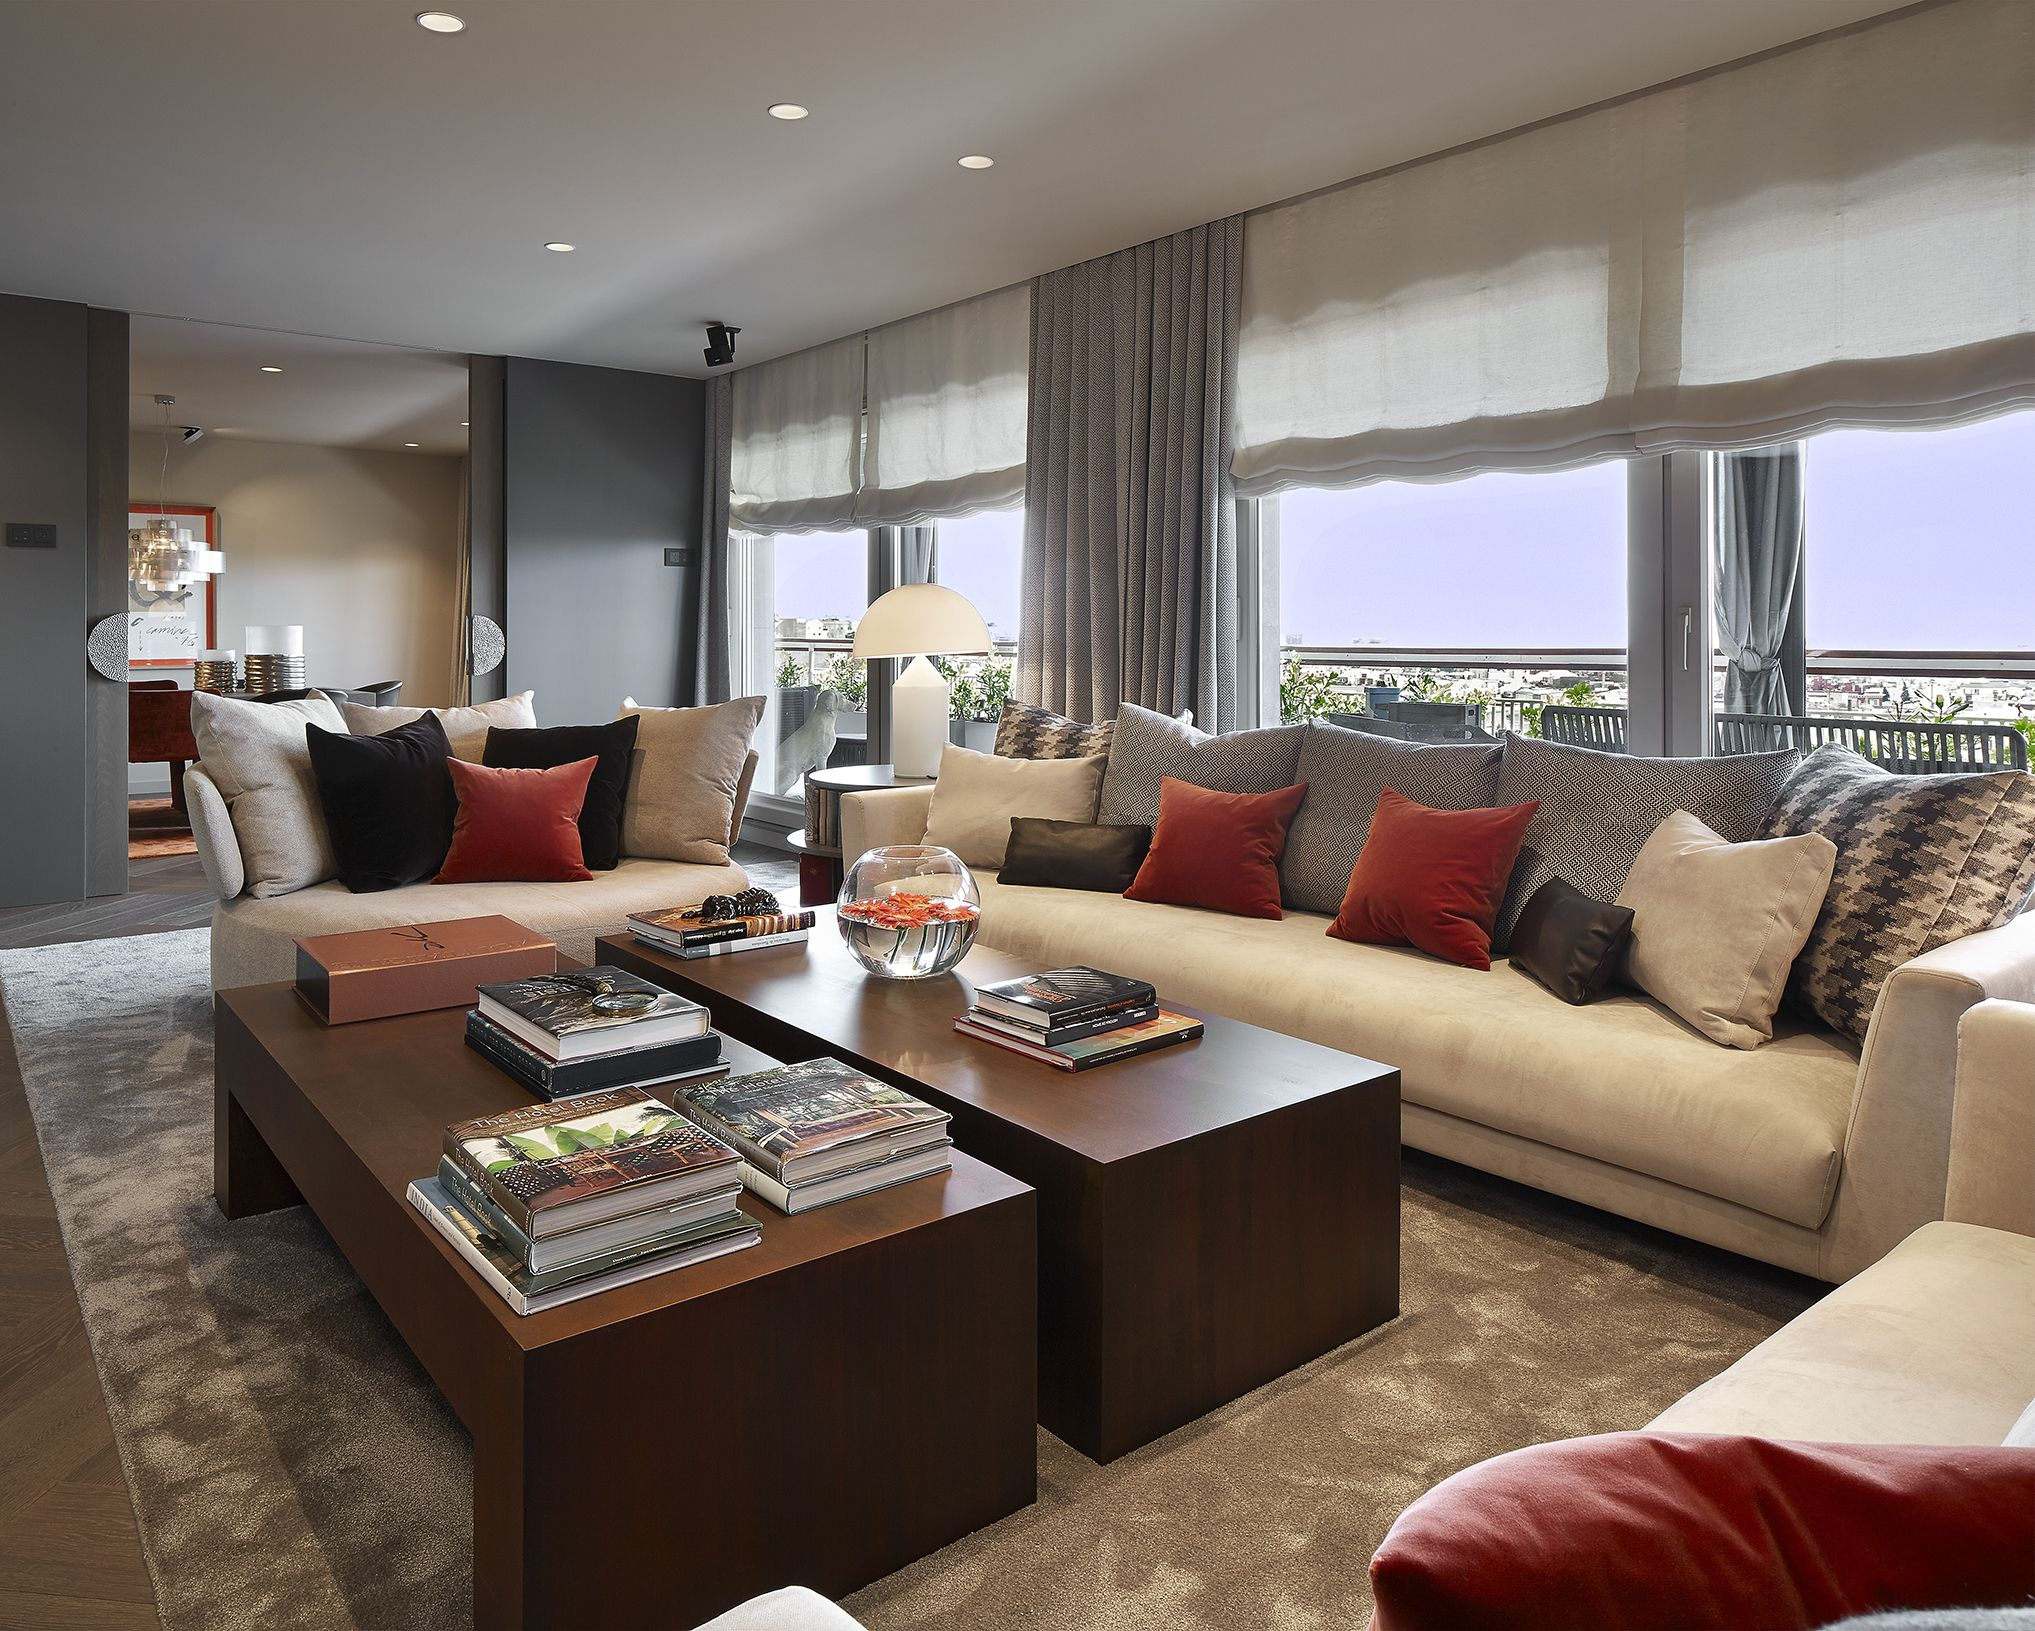 Molins Interiors // arquitectura interior - interiorismo - decoración - salón - sofás blancos - mesa de centro - salón recibir